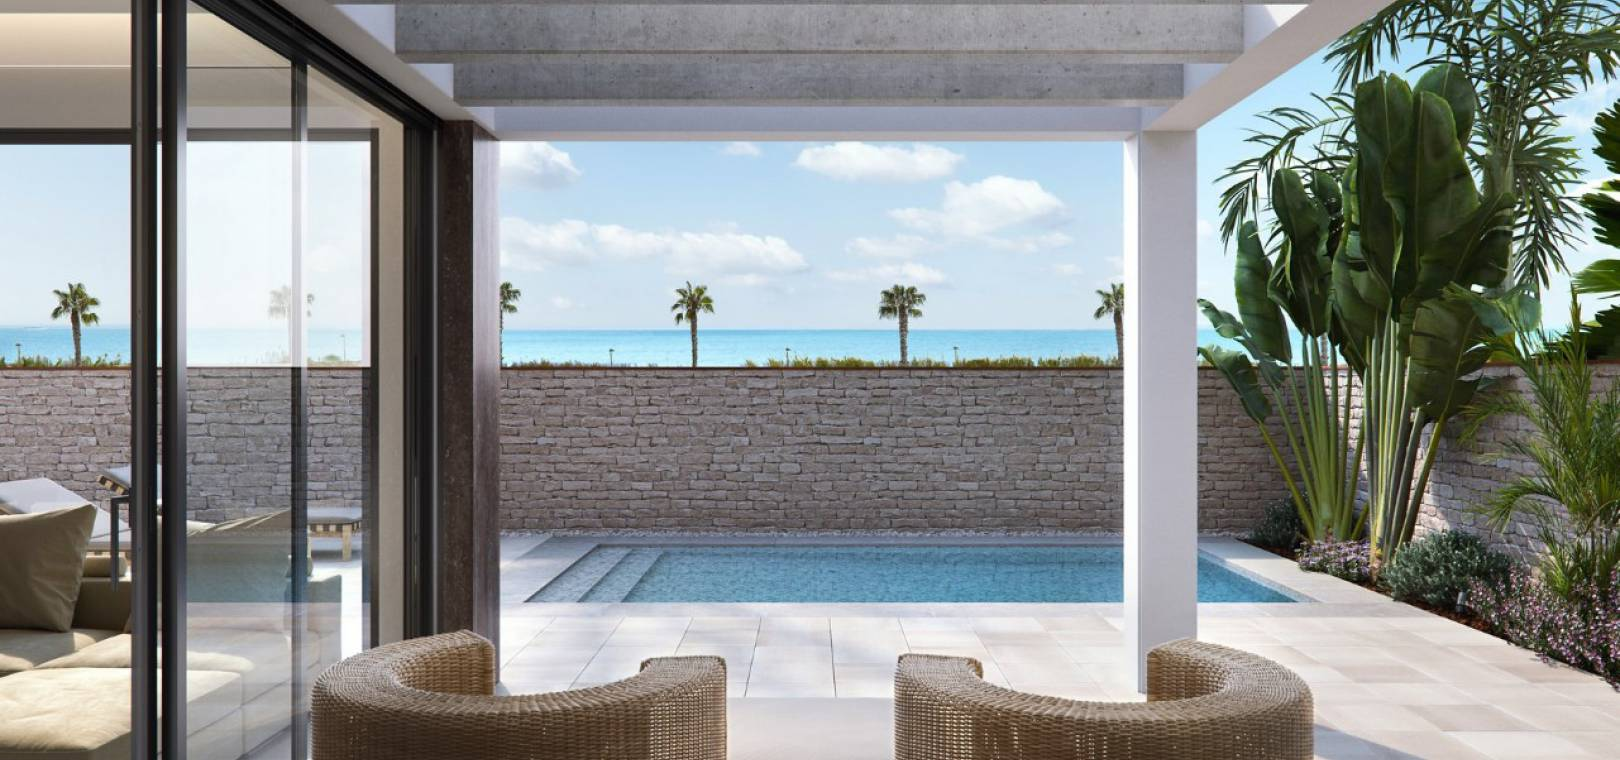 Torre_de_la_Horadada_New_Build_Luxury_Houses_For_Sale_nsp256_10